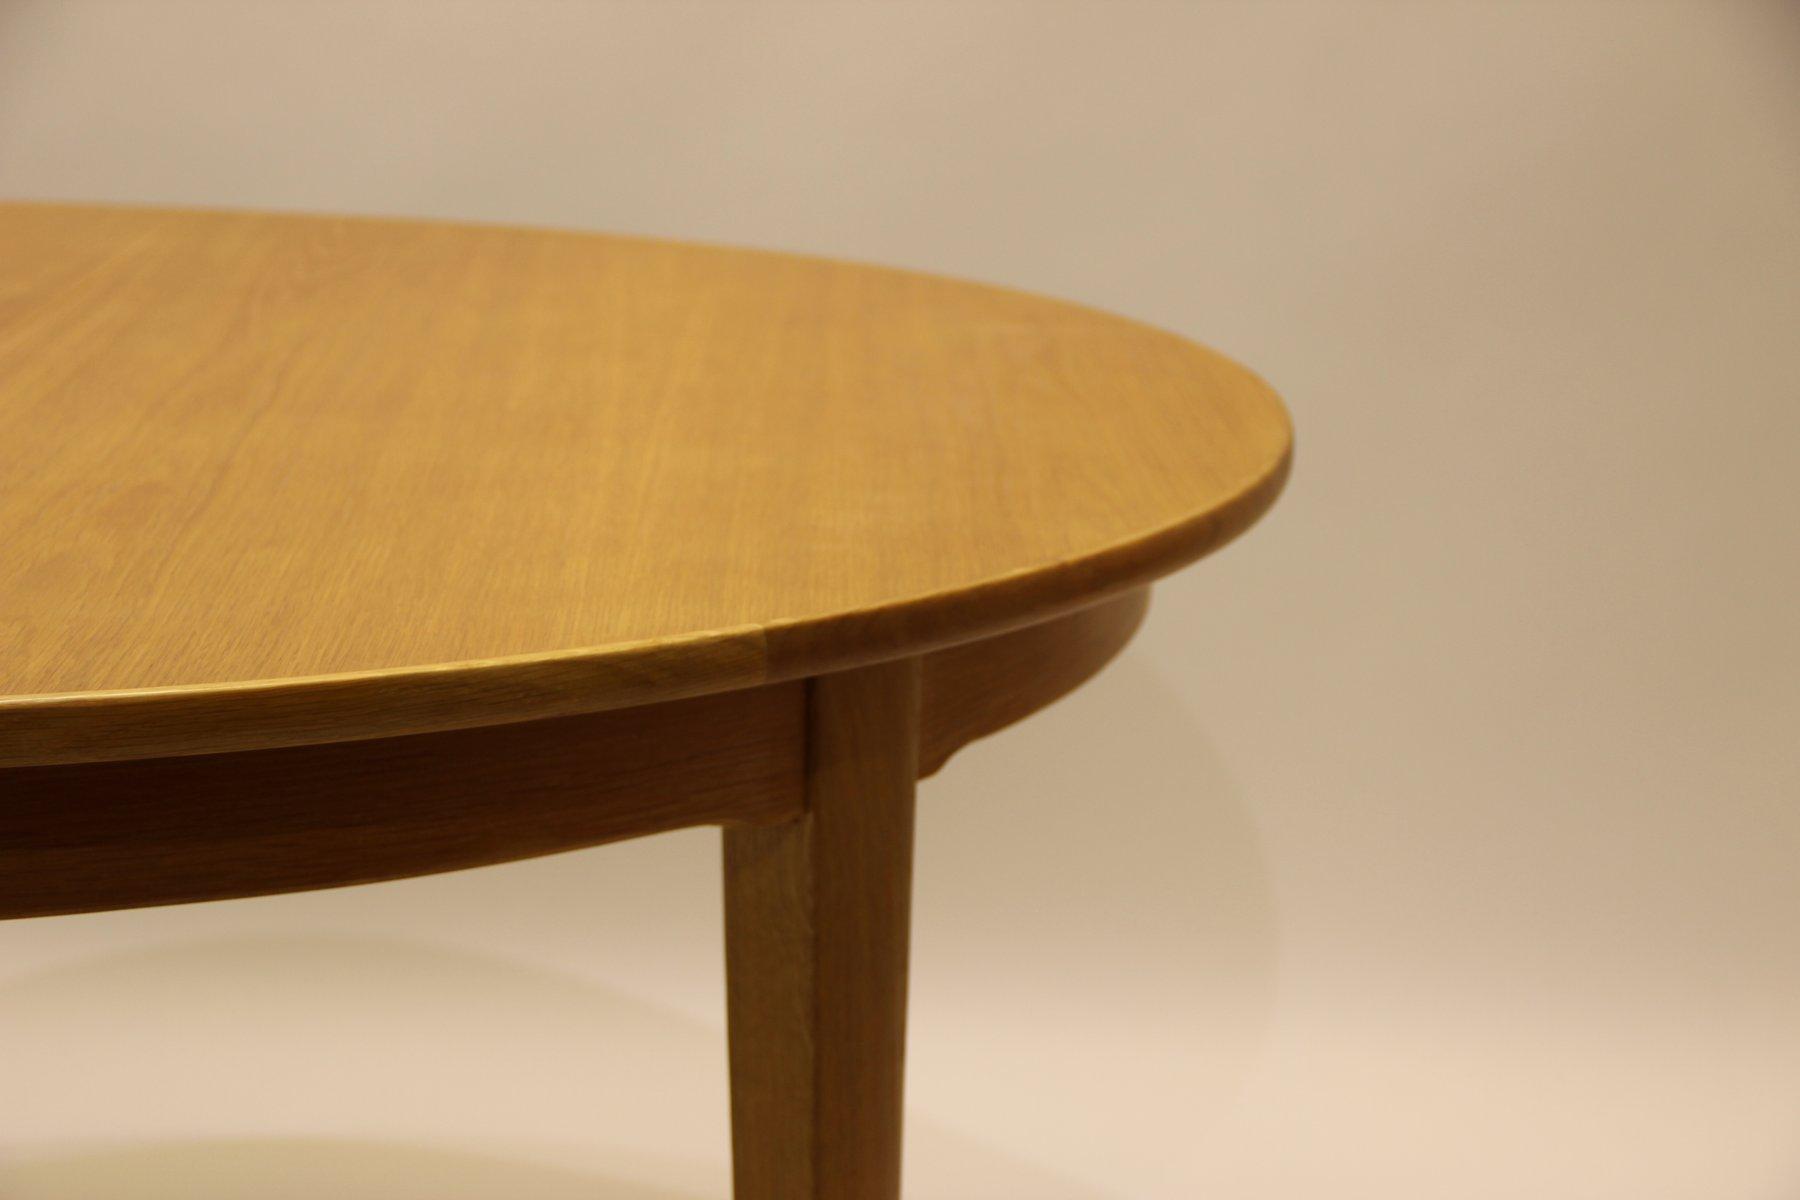 Vintage Oak Dining Table Vintage Model 55 Oak Dining Table By Gunni Omann For Omann Jun For